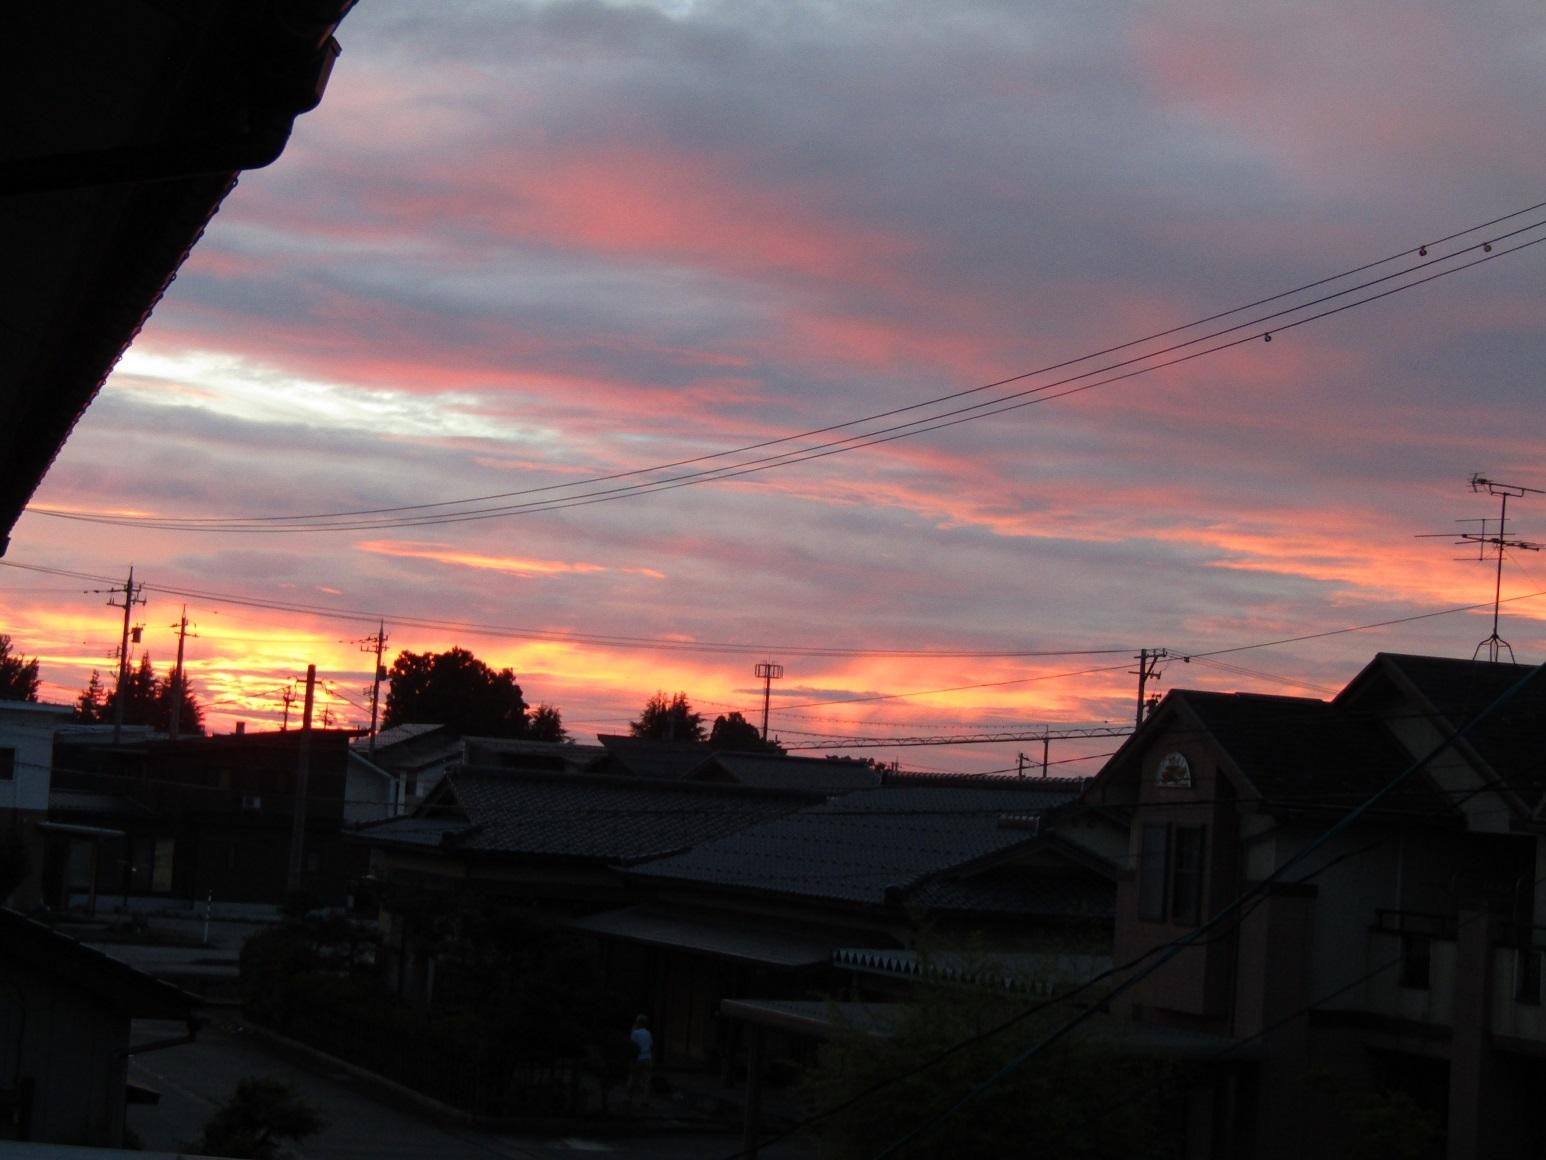 台風影響の空模様_f0281398_22492272.jpg